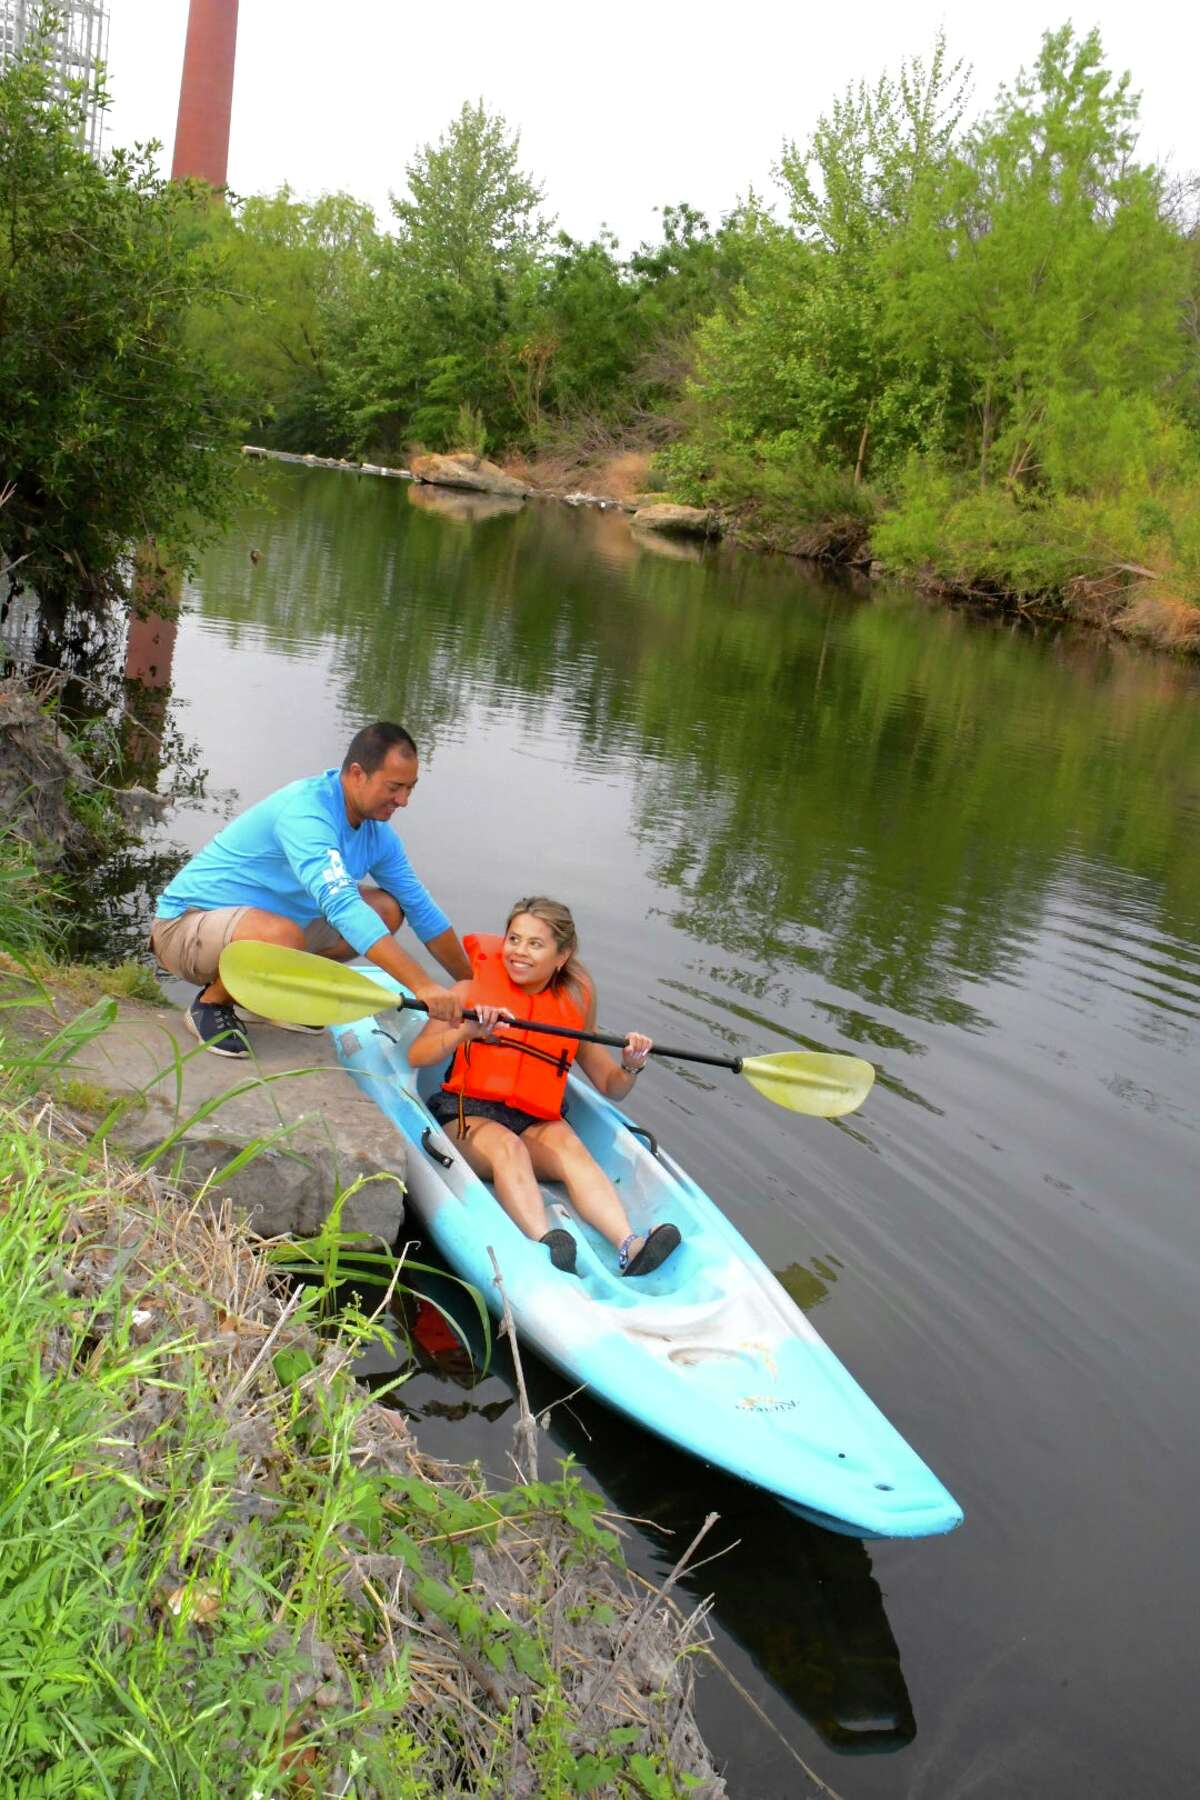 More ways to explore the San Antonio River are here.